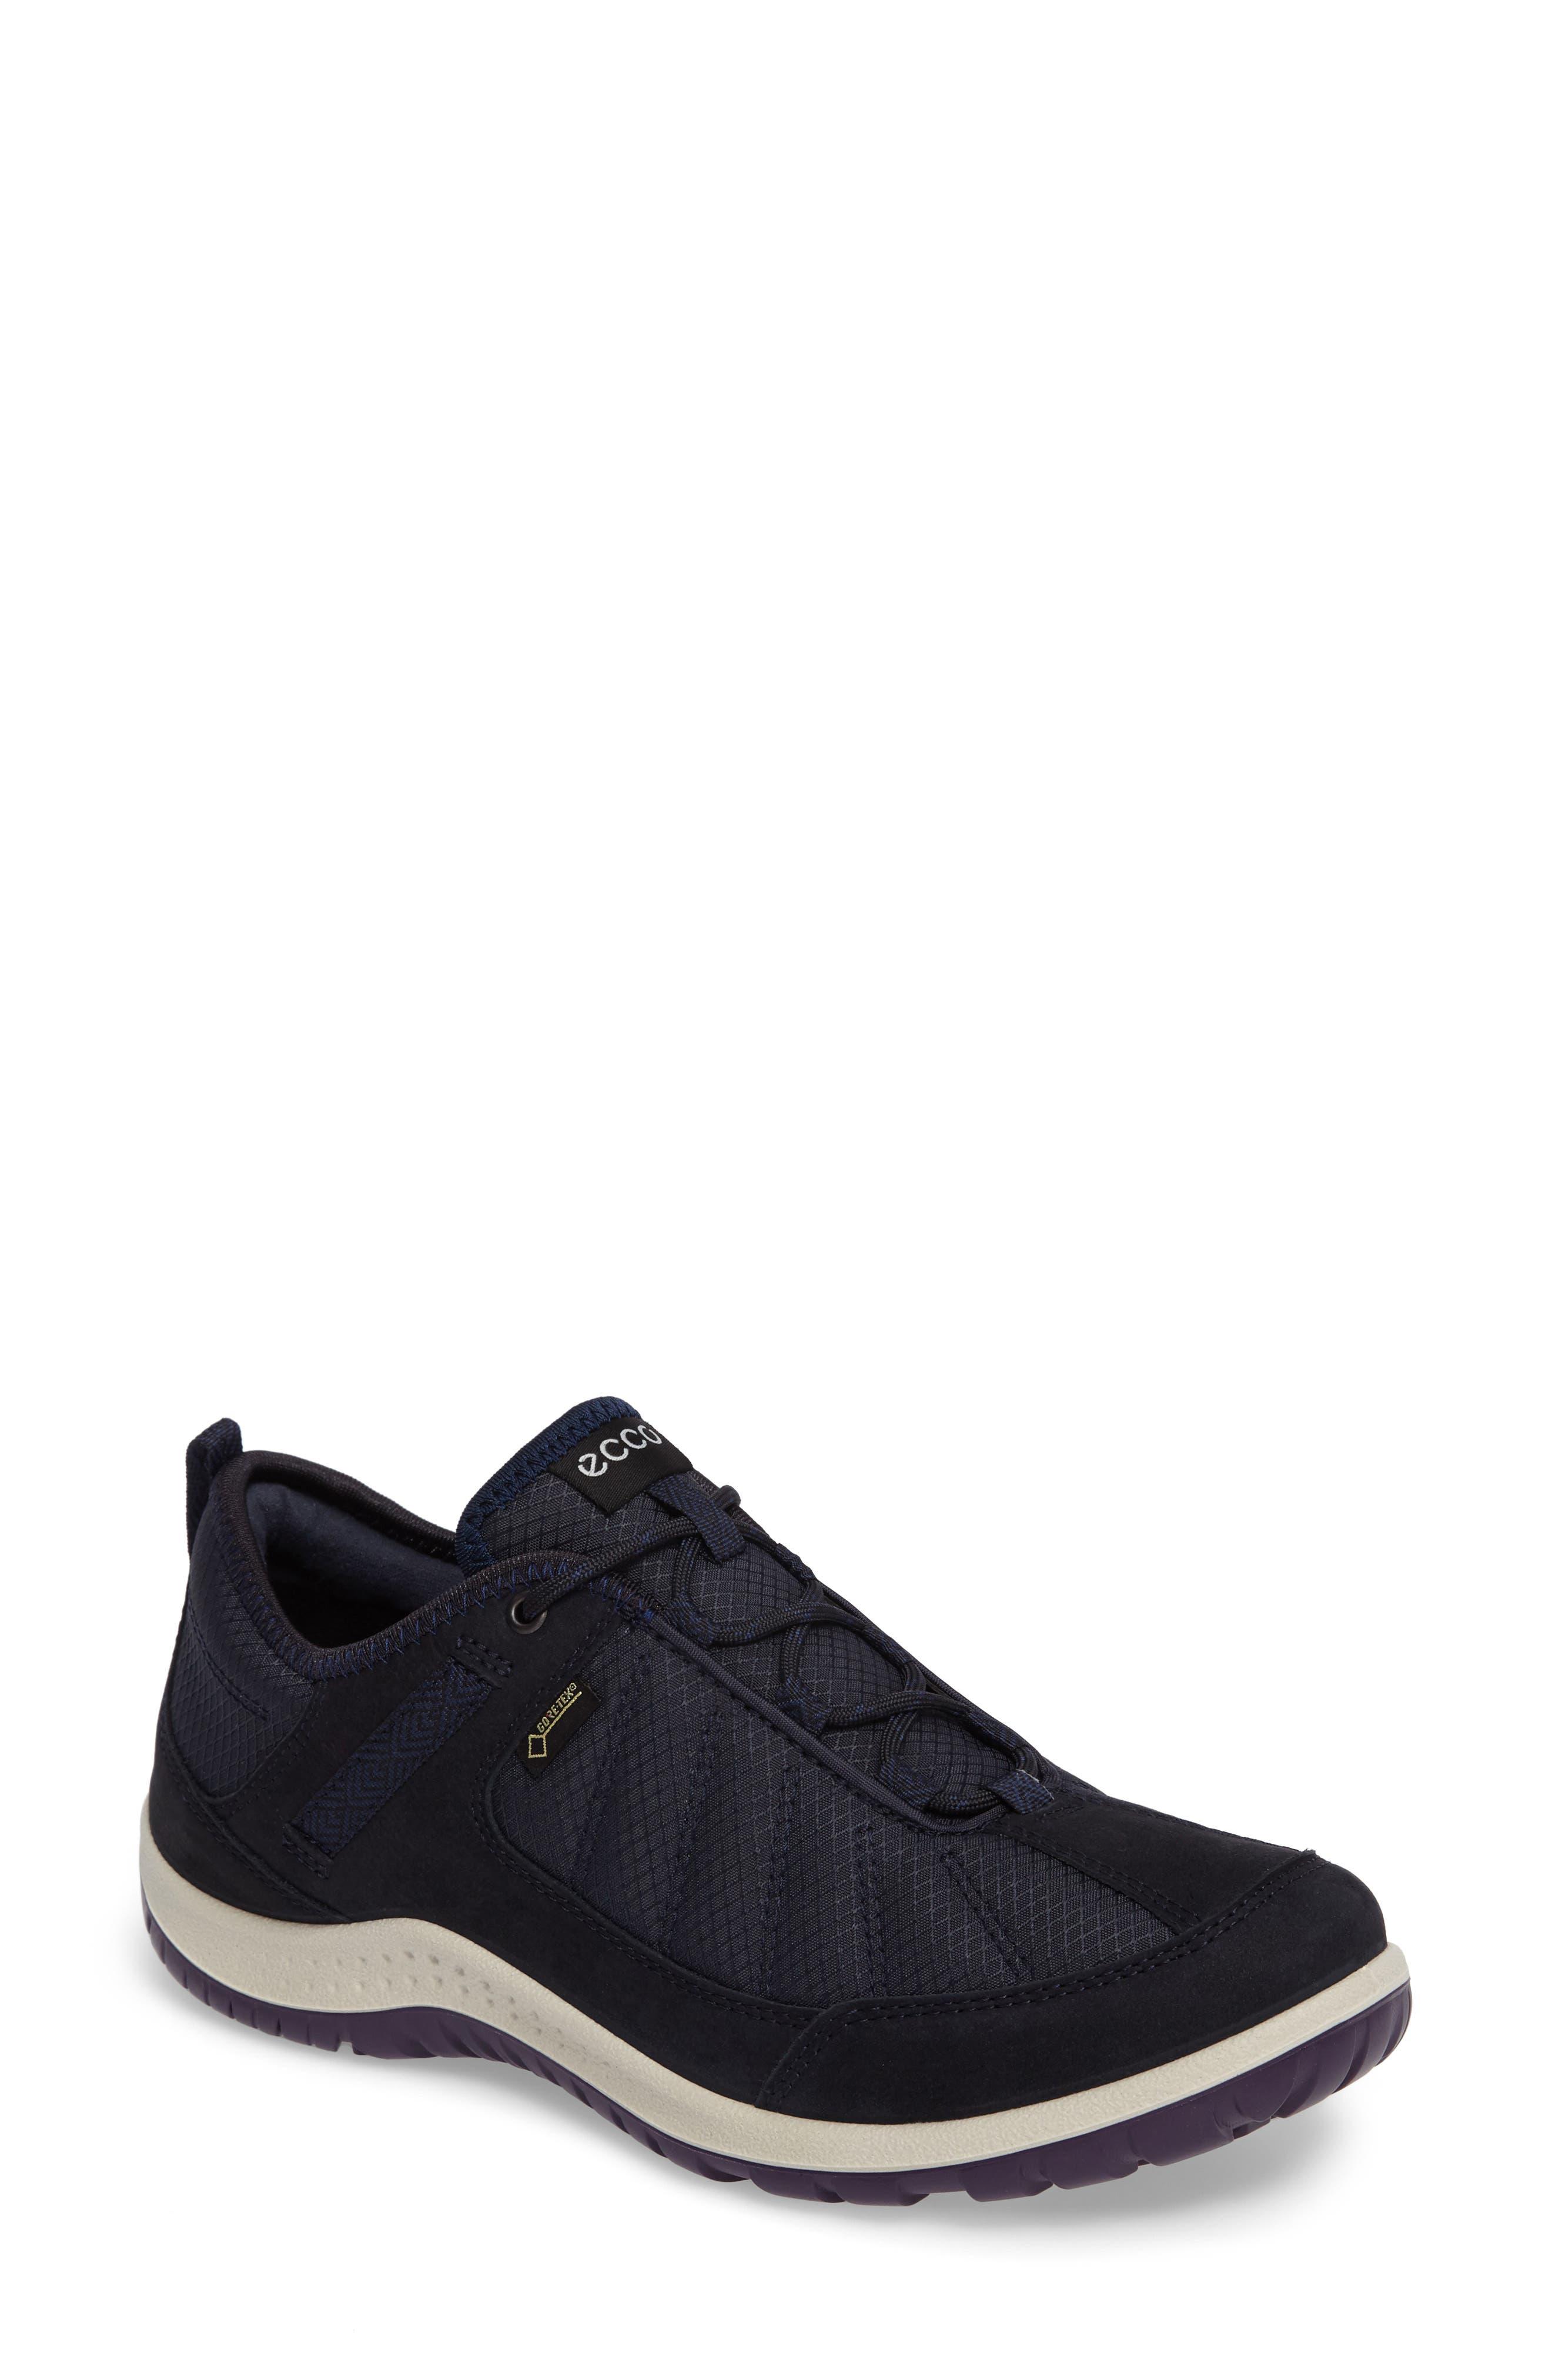 ECCO Aspina GTX Waterproof Sneaker (Women)